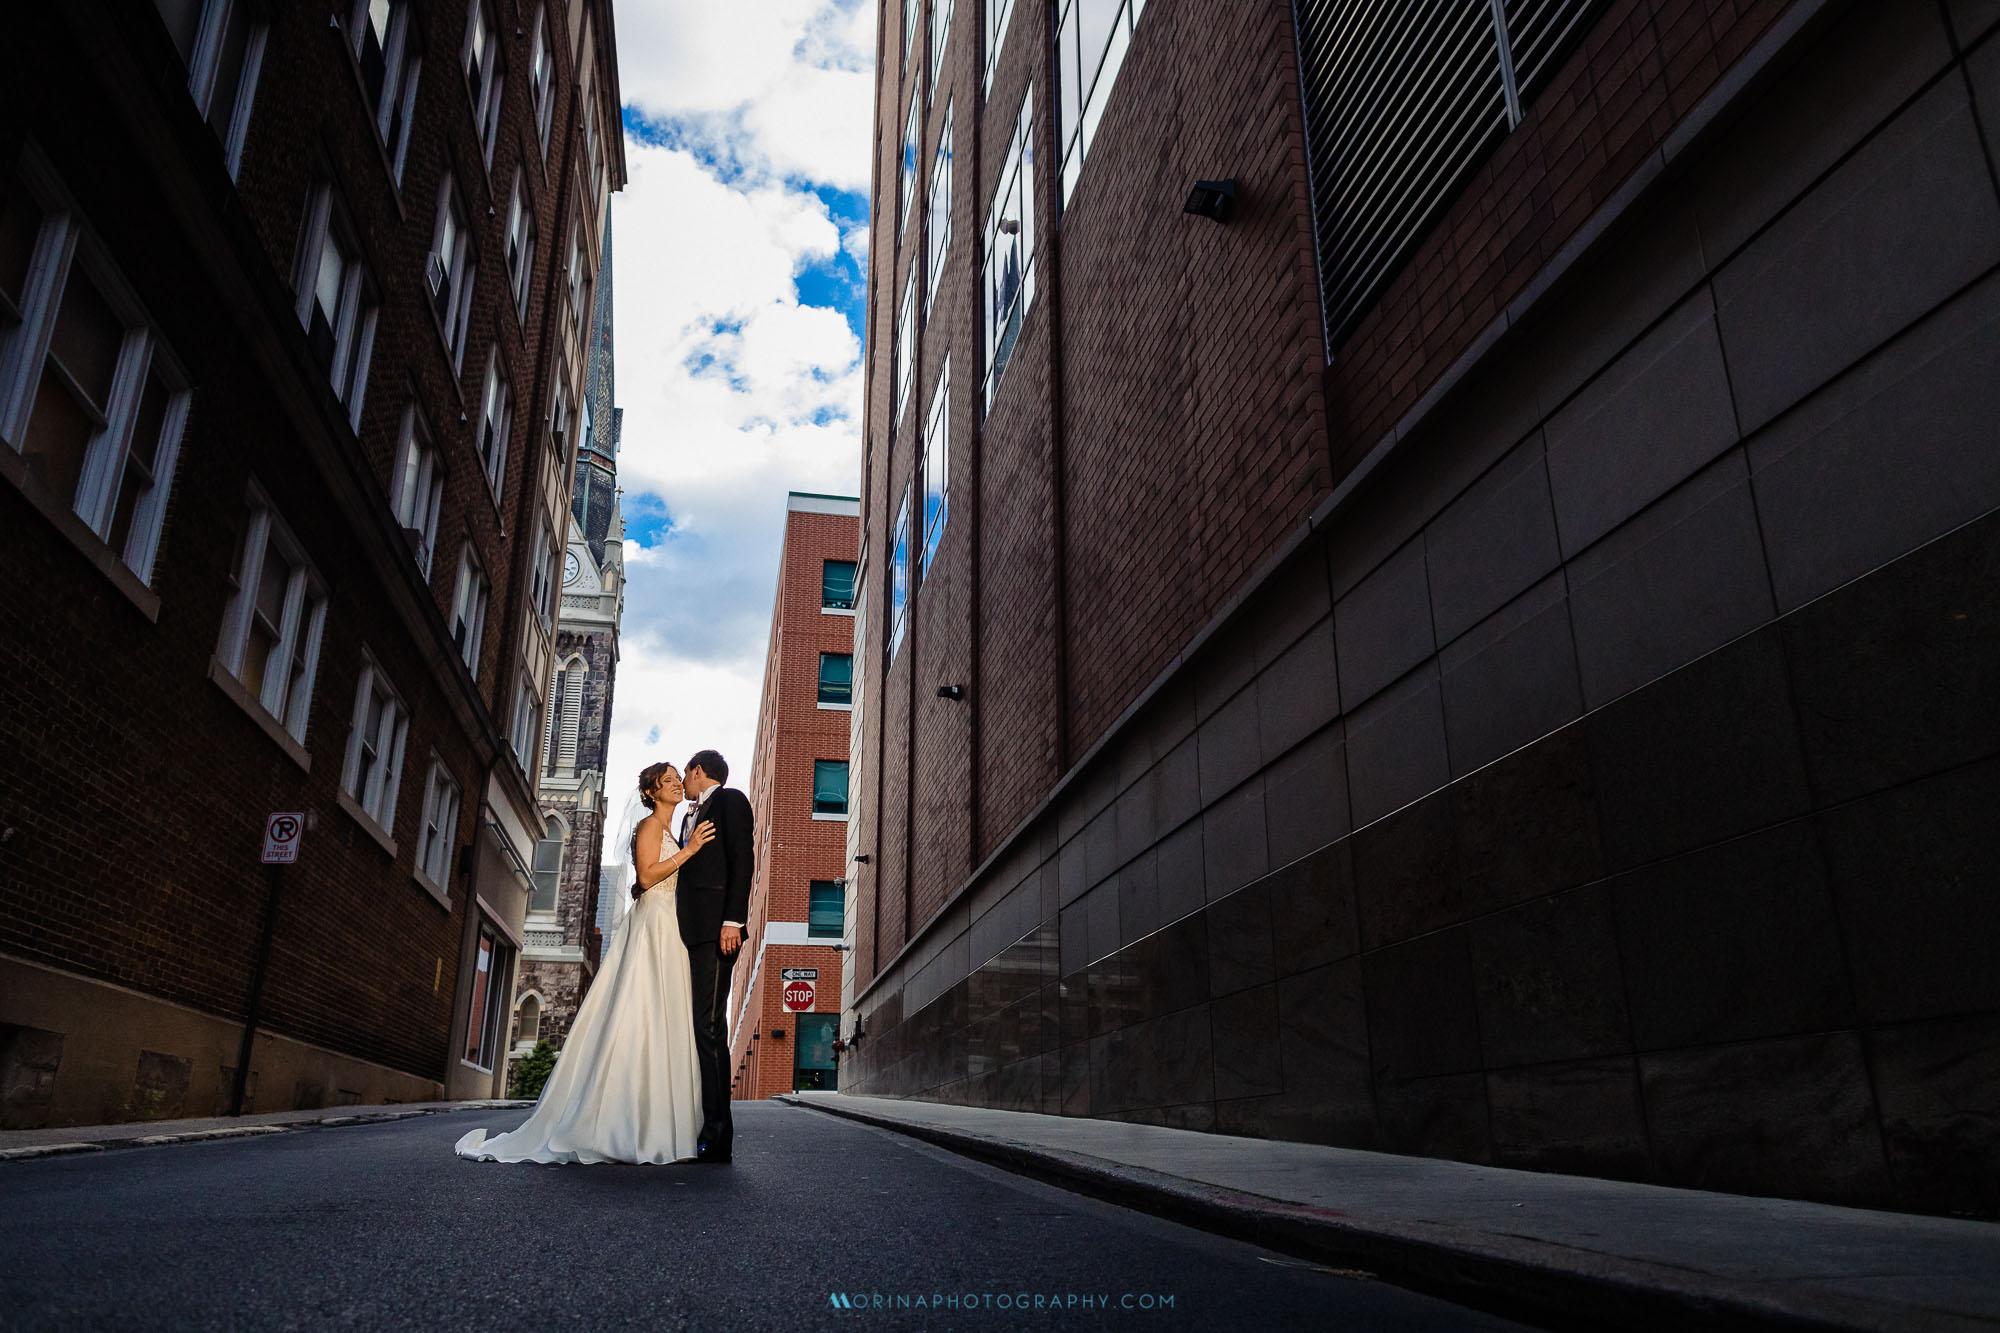 Ilhana & Jonathan Wedding at Vault 634 - Allentown 0044.jpg